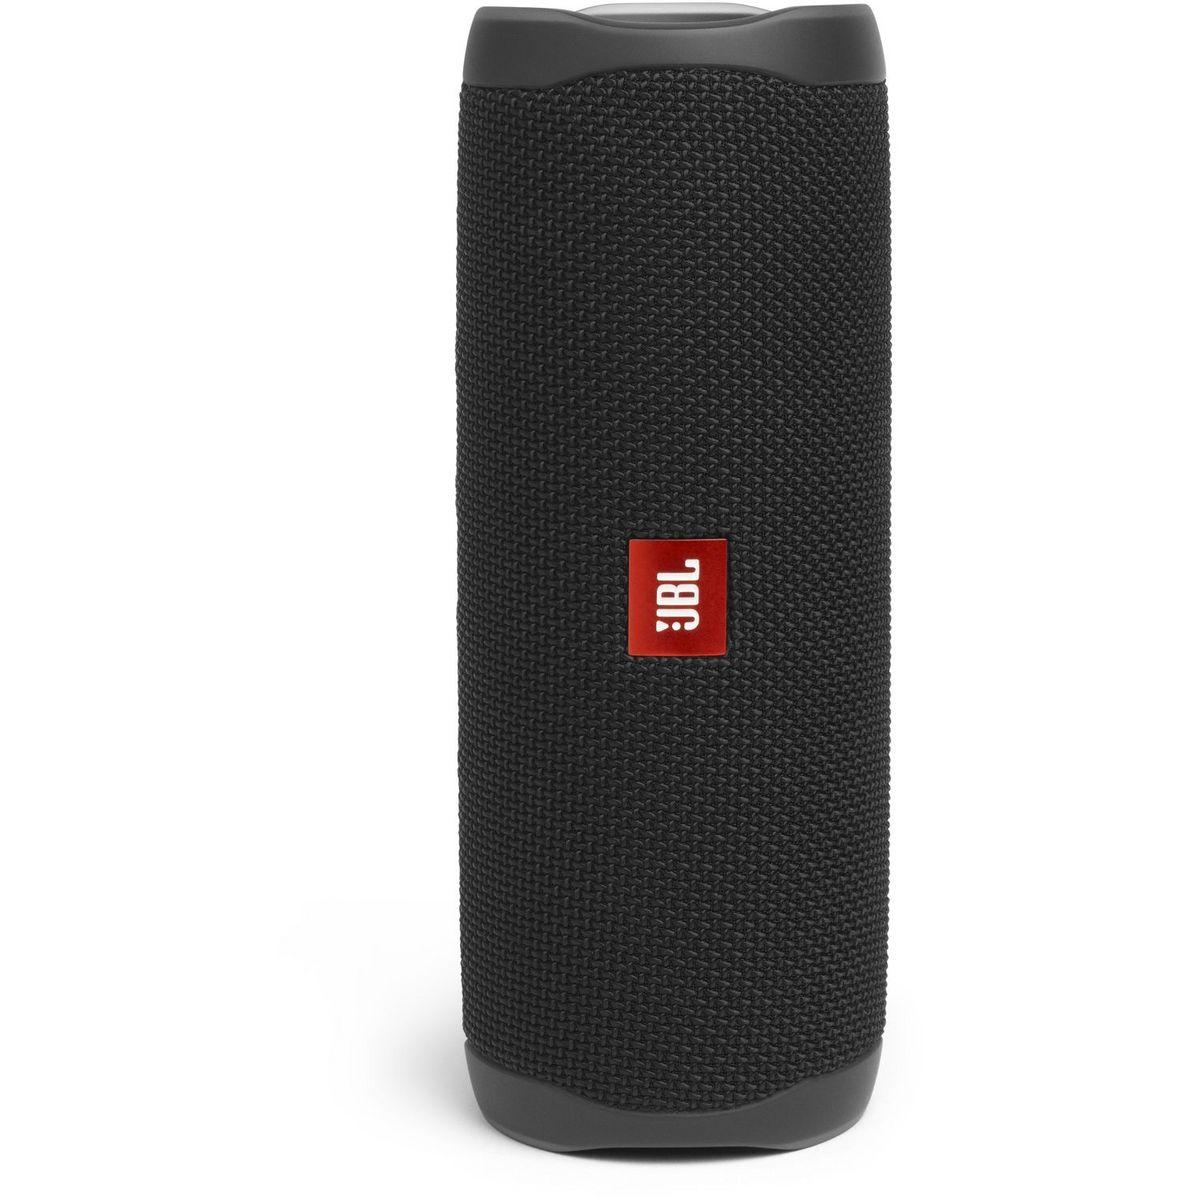 Enceinte portable Bluetooth - Noir - Flip 5